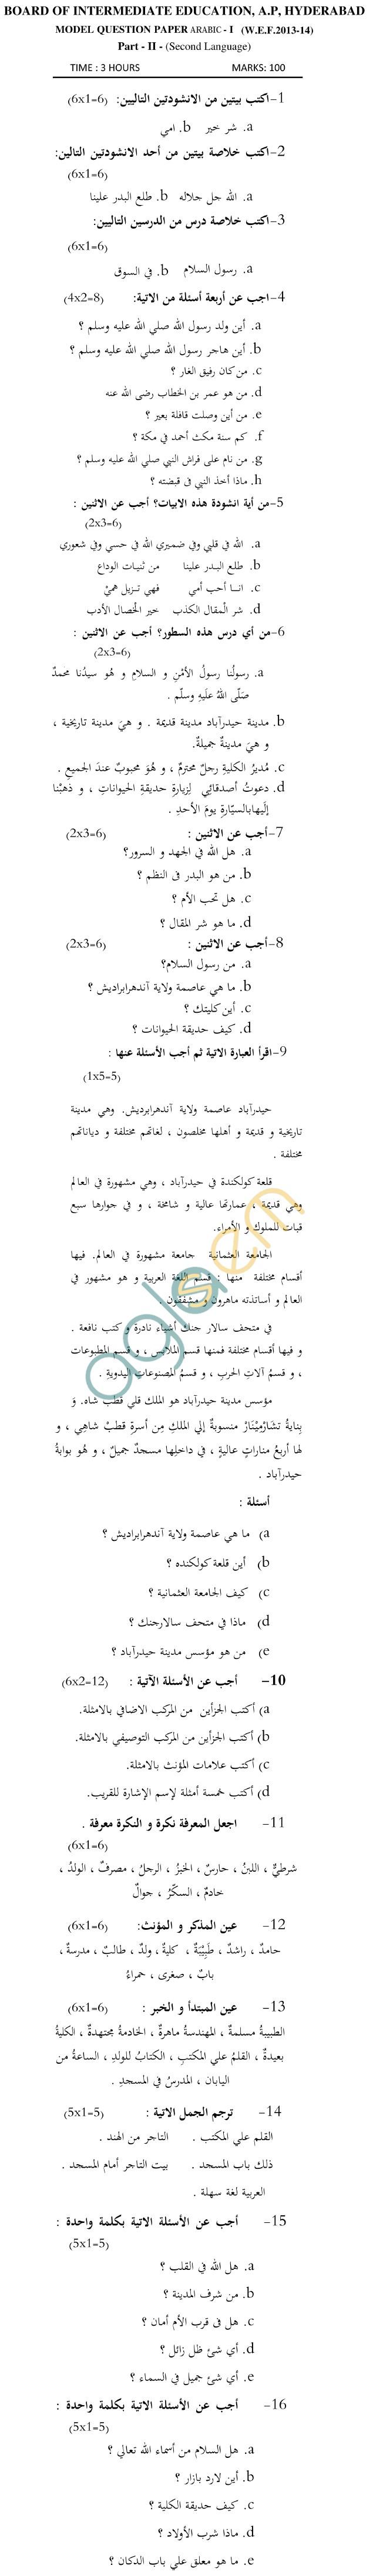 AP Inter 1st Year Model Paper Part 2 Arabic – AglaSem Schools